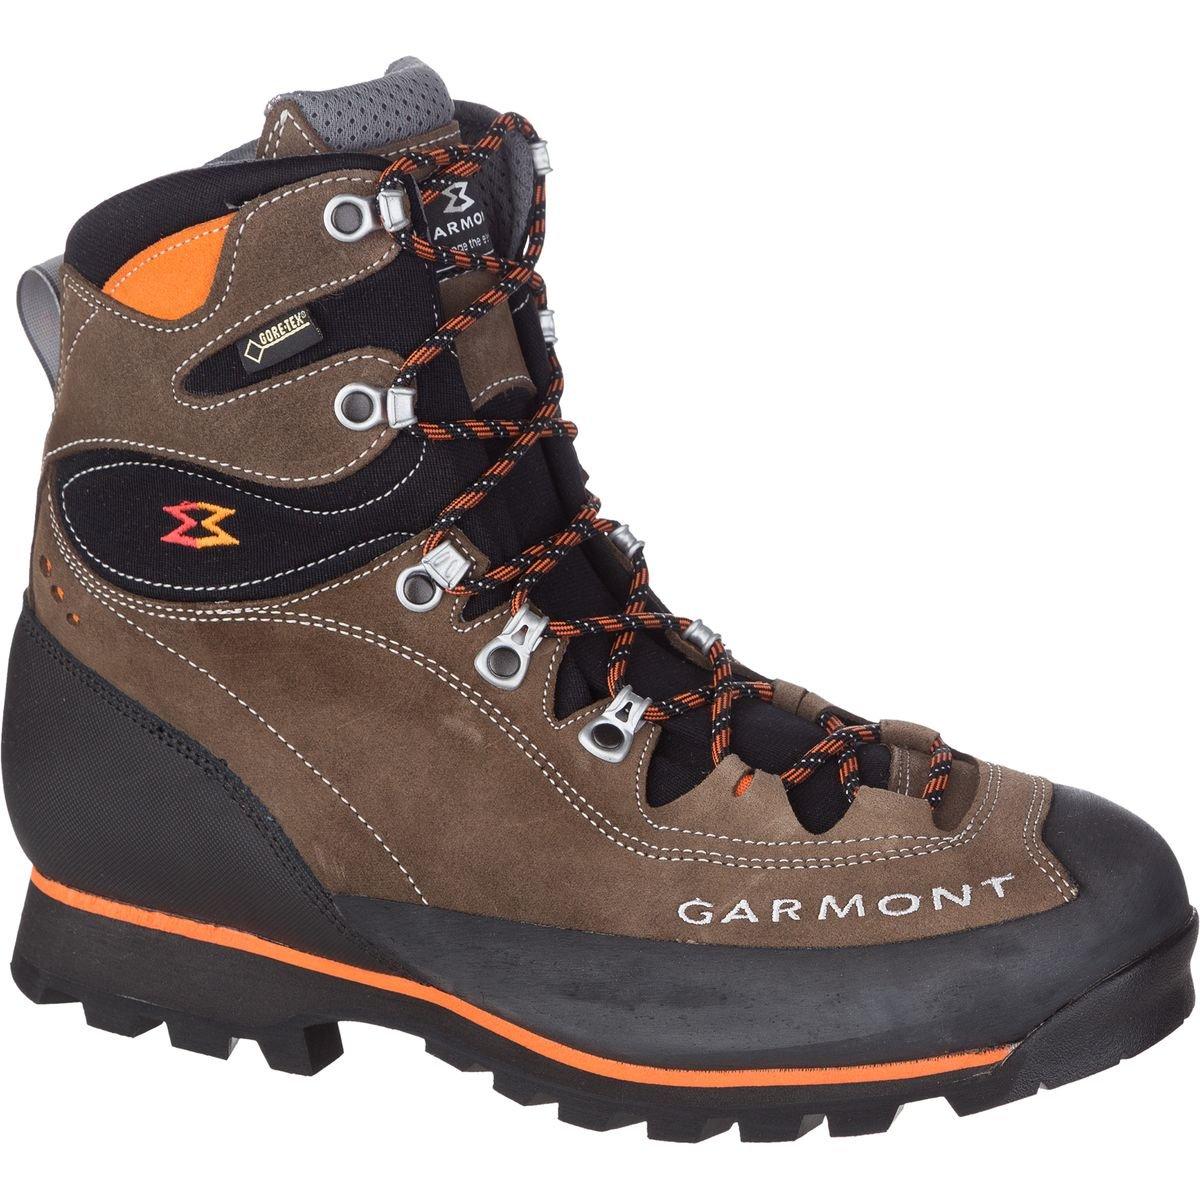 Garmont Tower Trek GTX Backpacking Boot